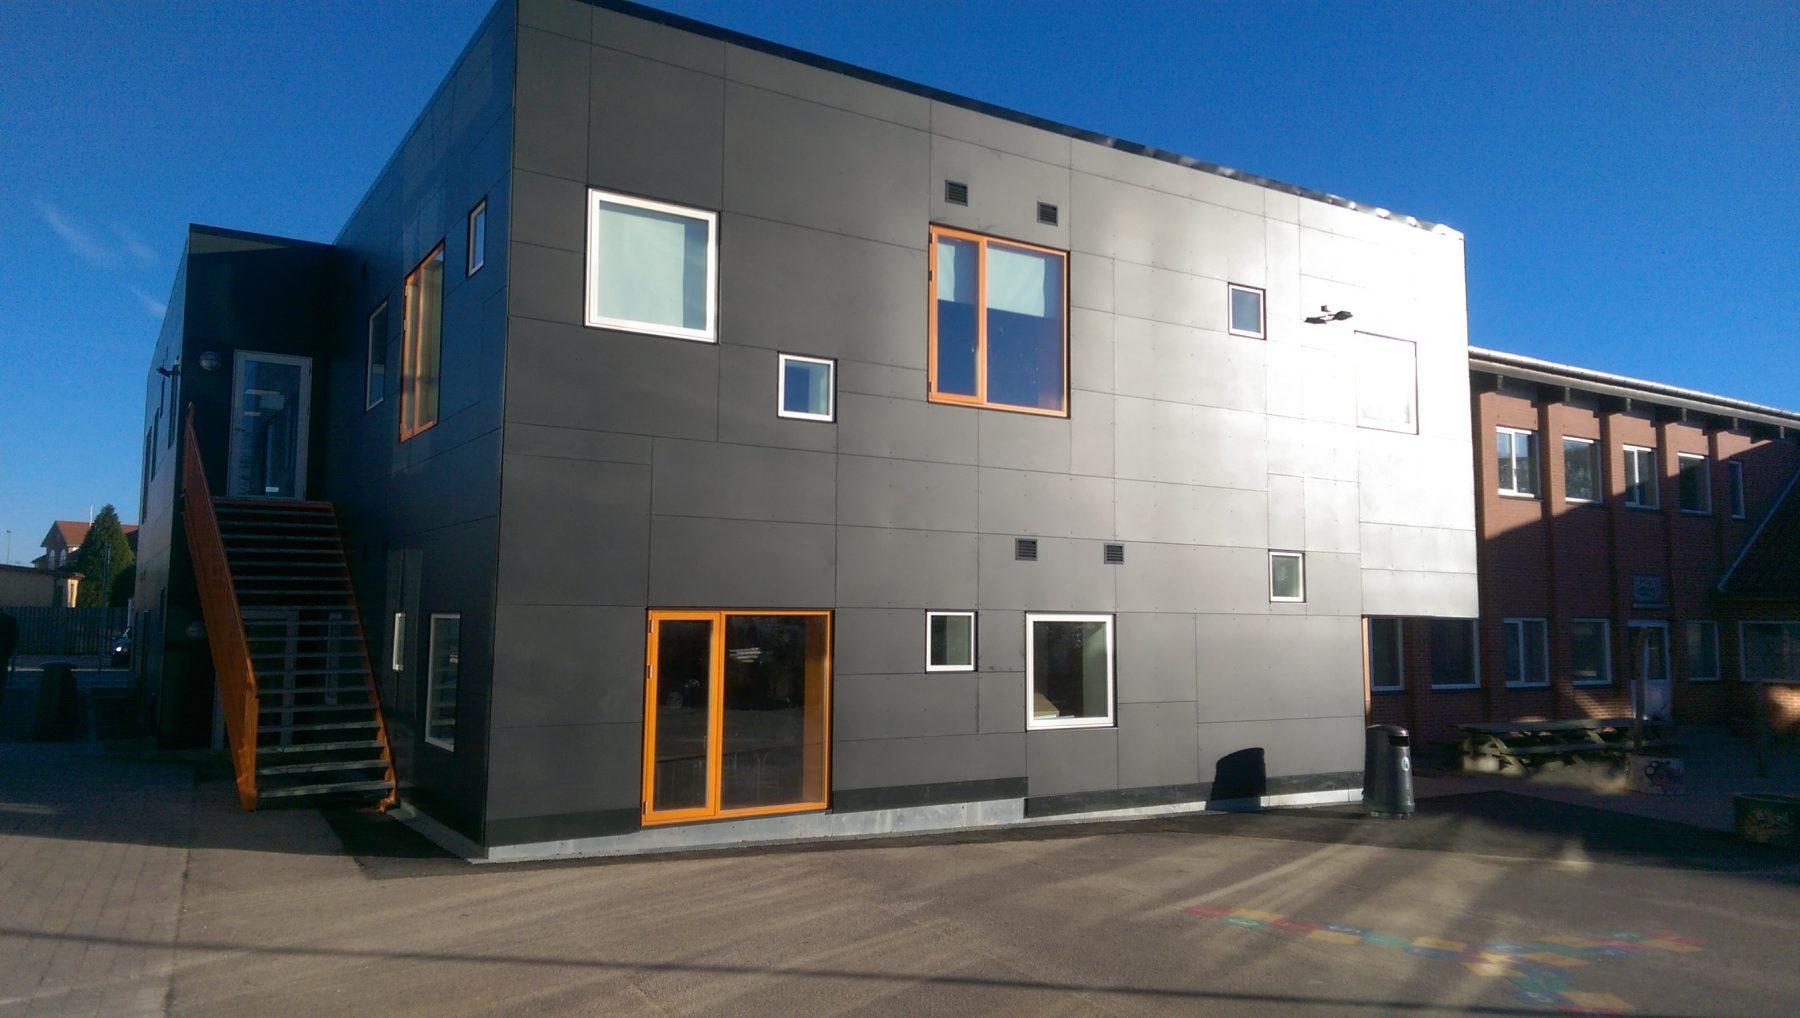 Bakkeskolen Hørning, Skanderborg - perspektiv